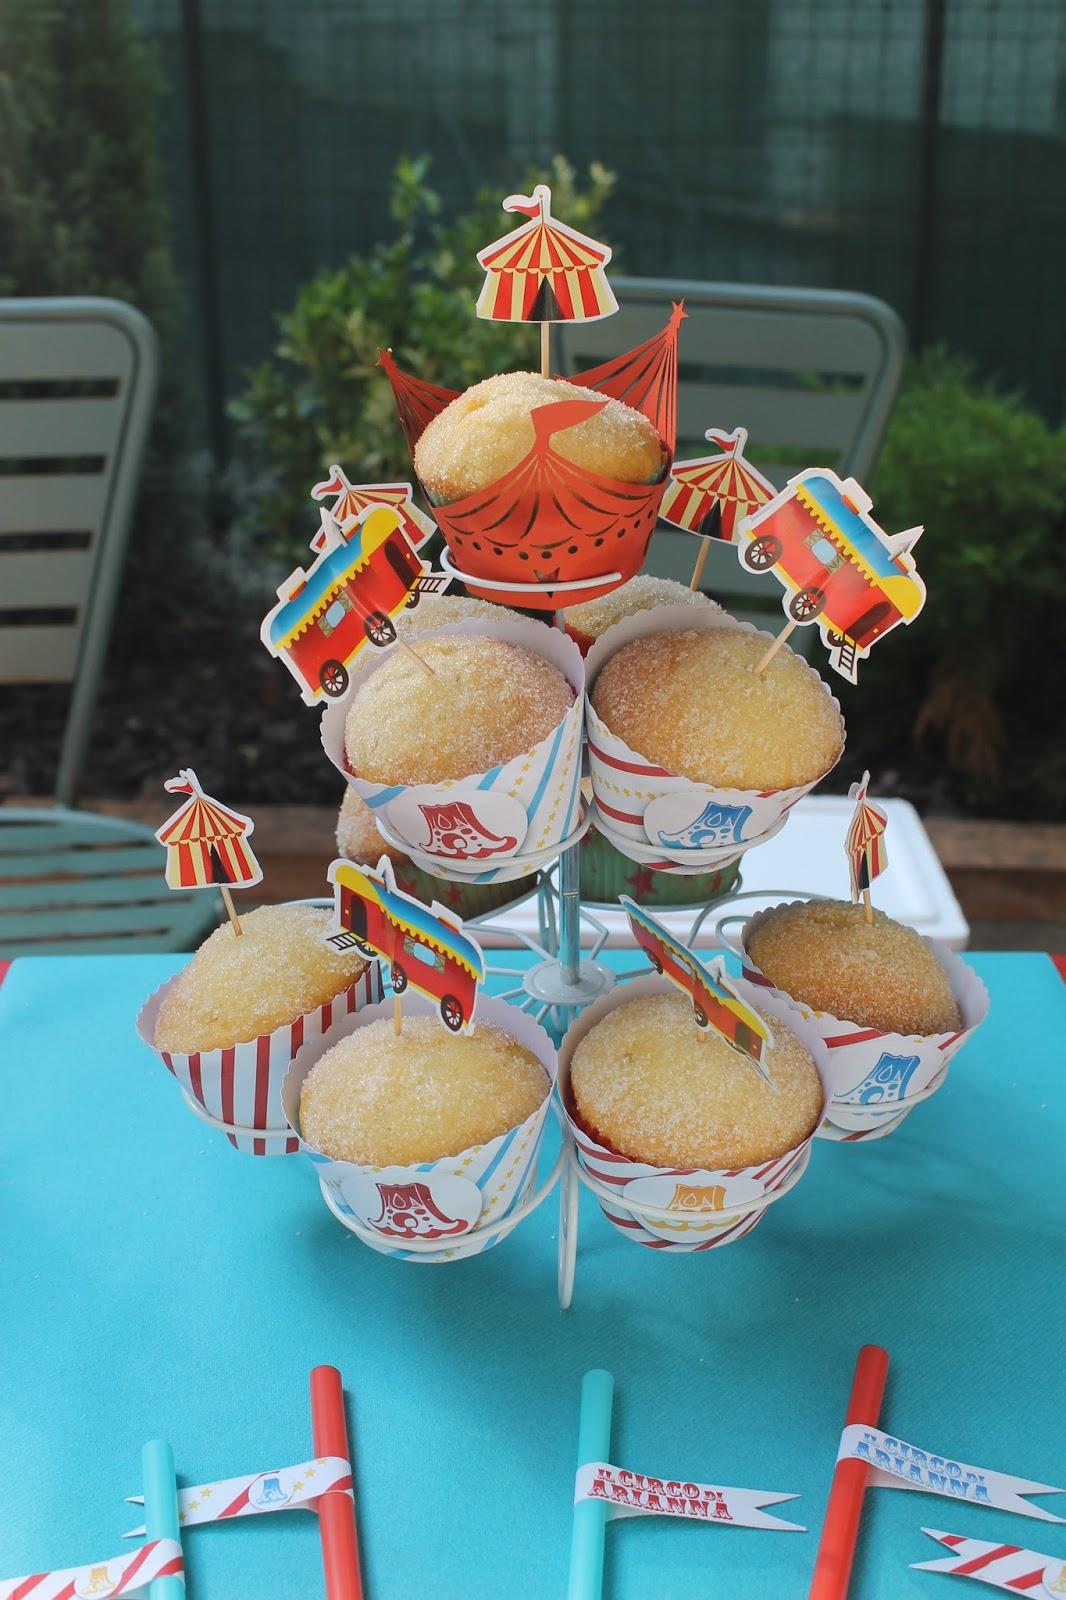 donuts maffin